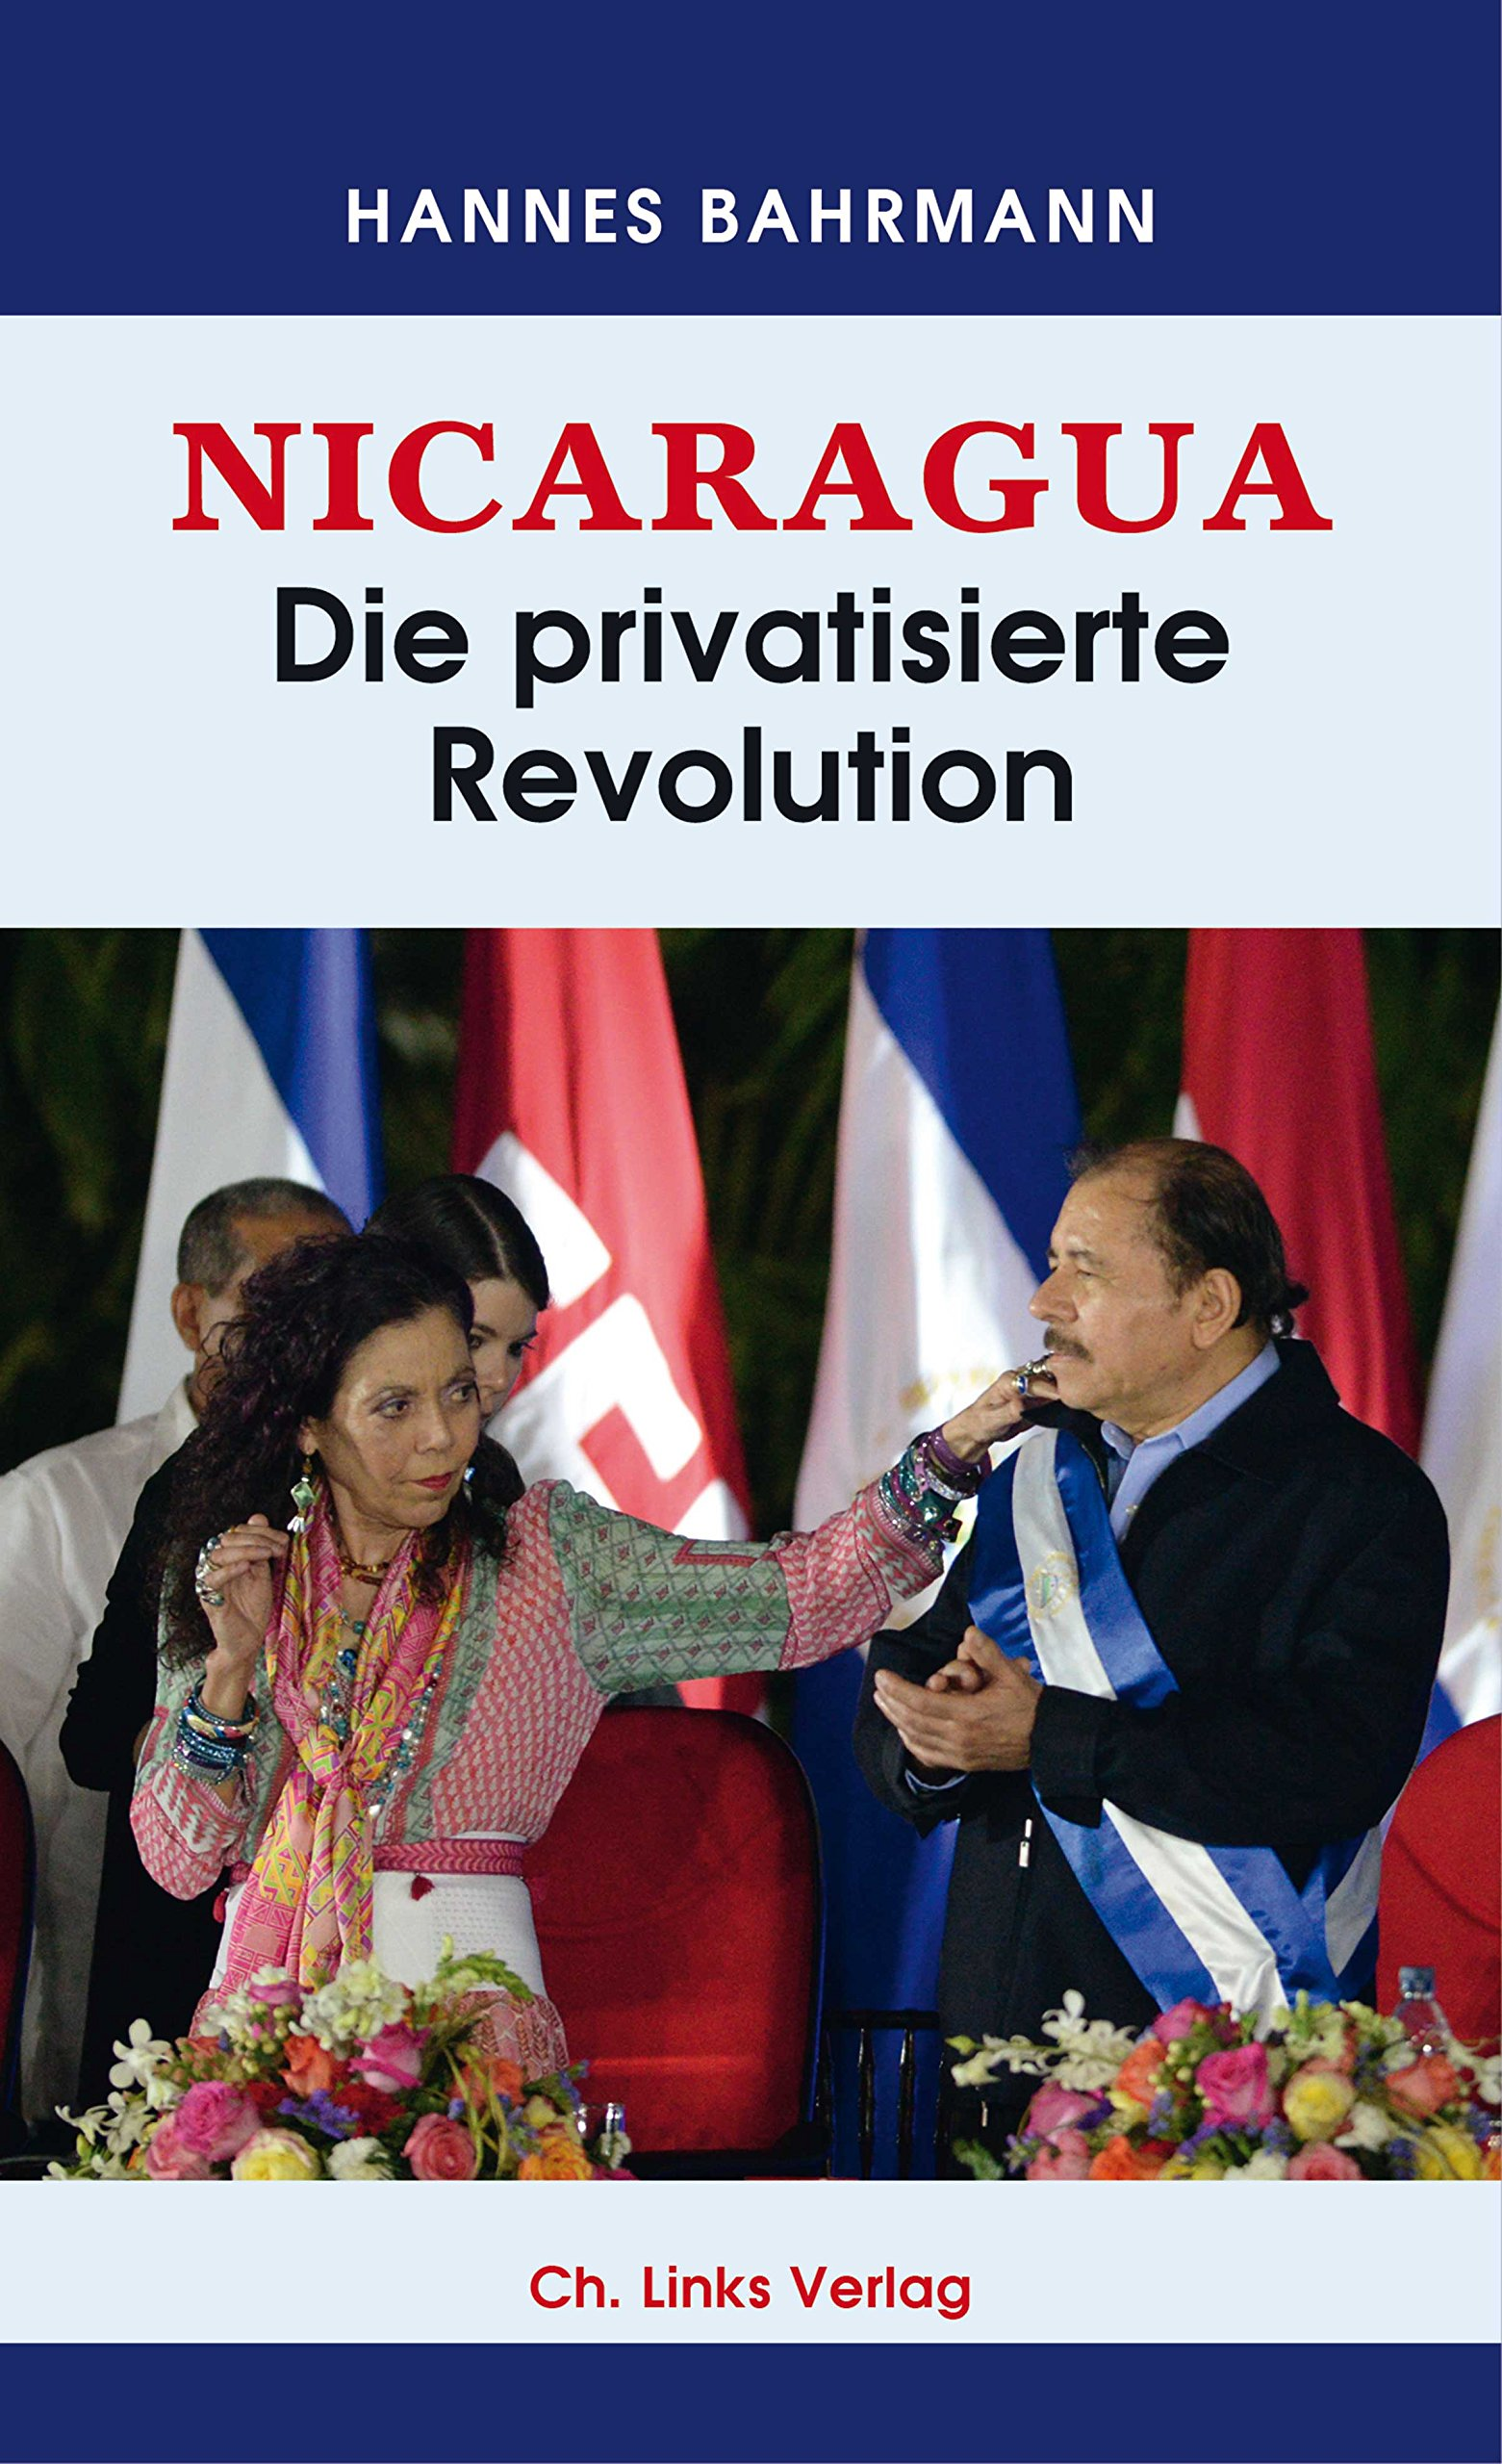 Nicaragua: Die privatisierte Revolution